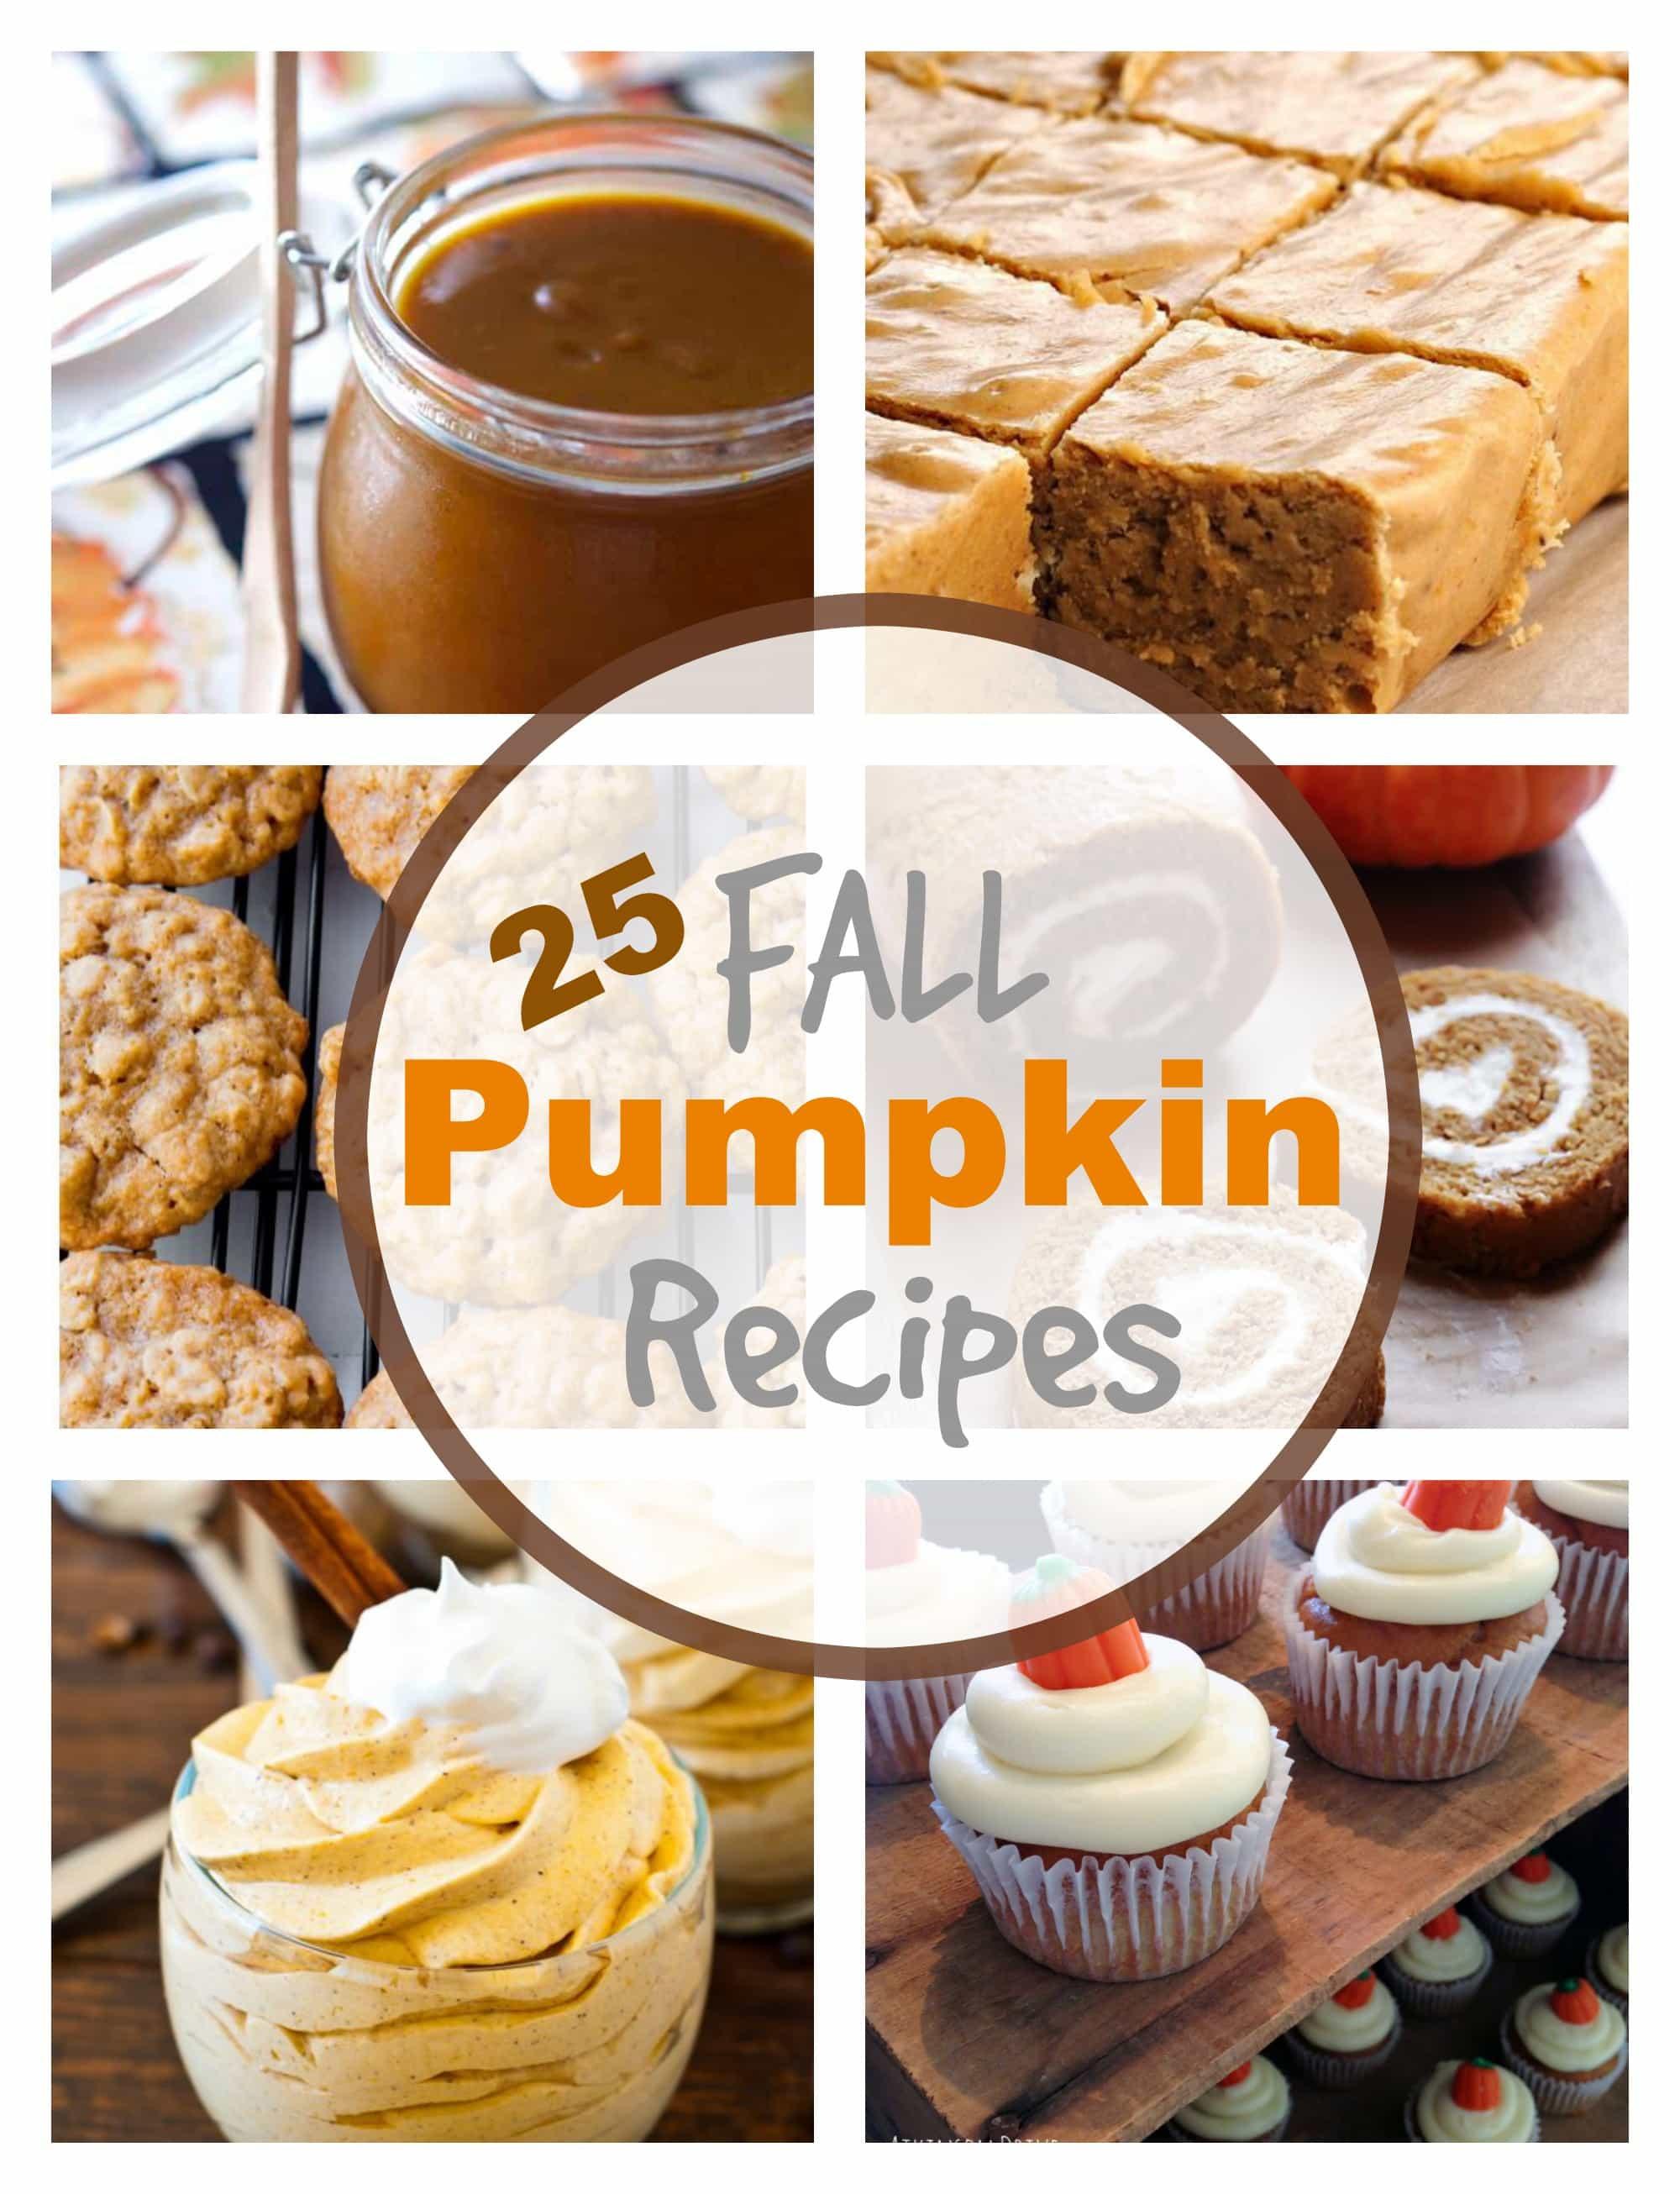 Pumpkin Recipes For Fall  25 Fall Pumpkin Recipes PinkWhen